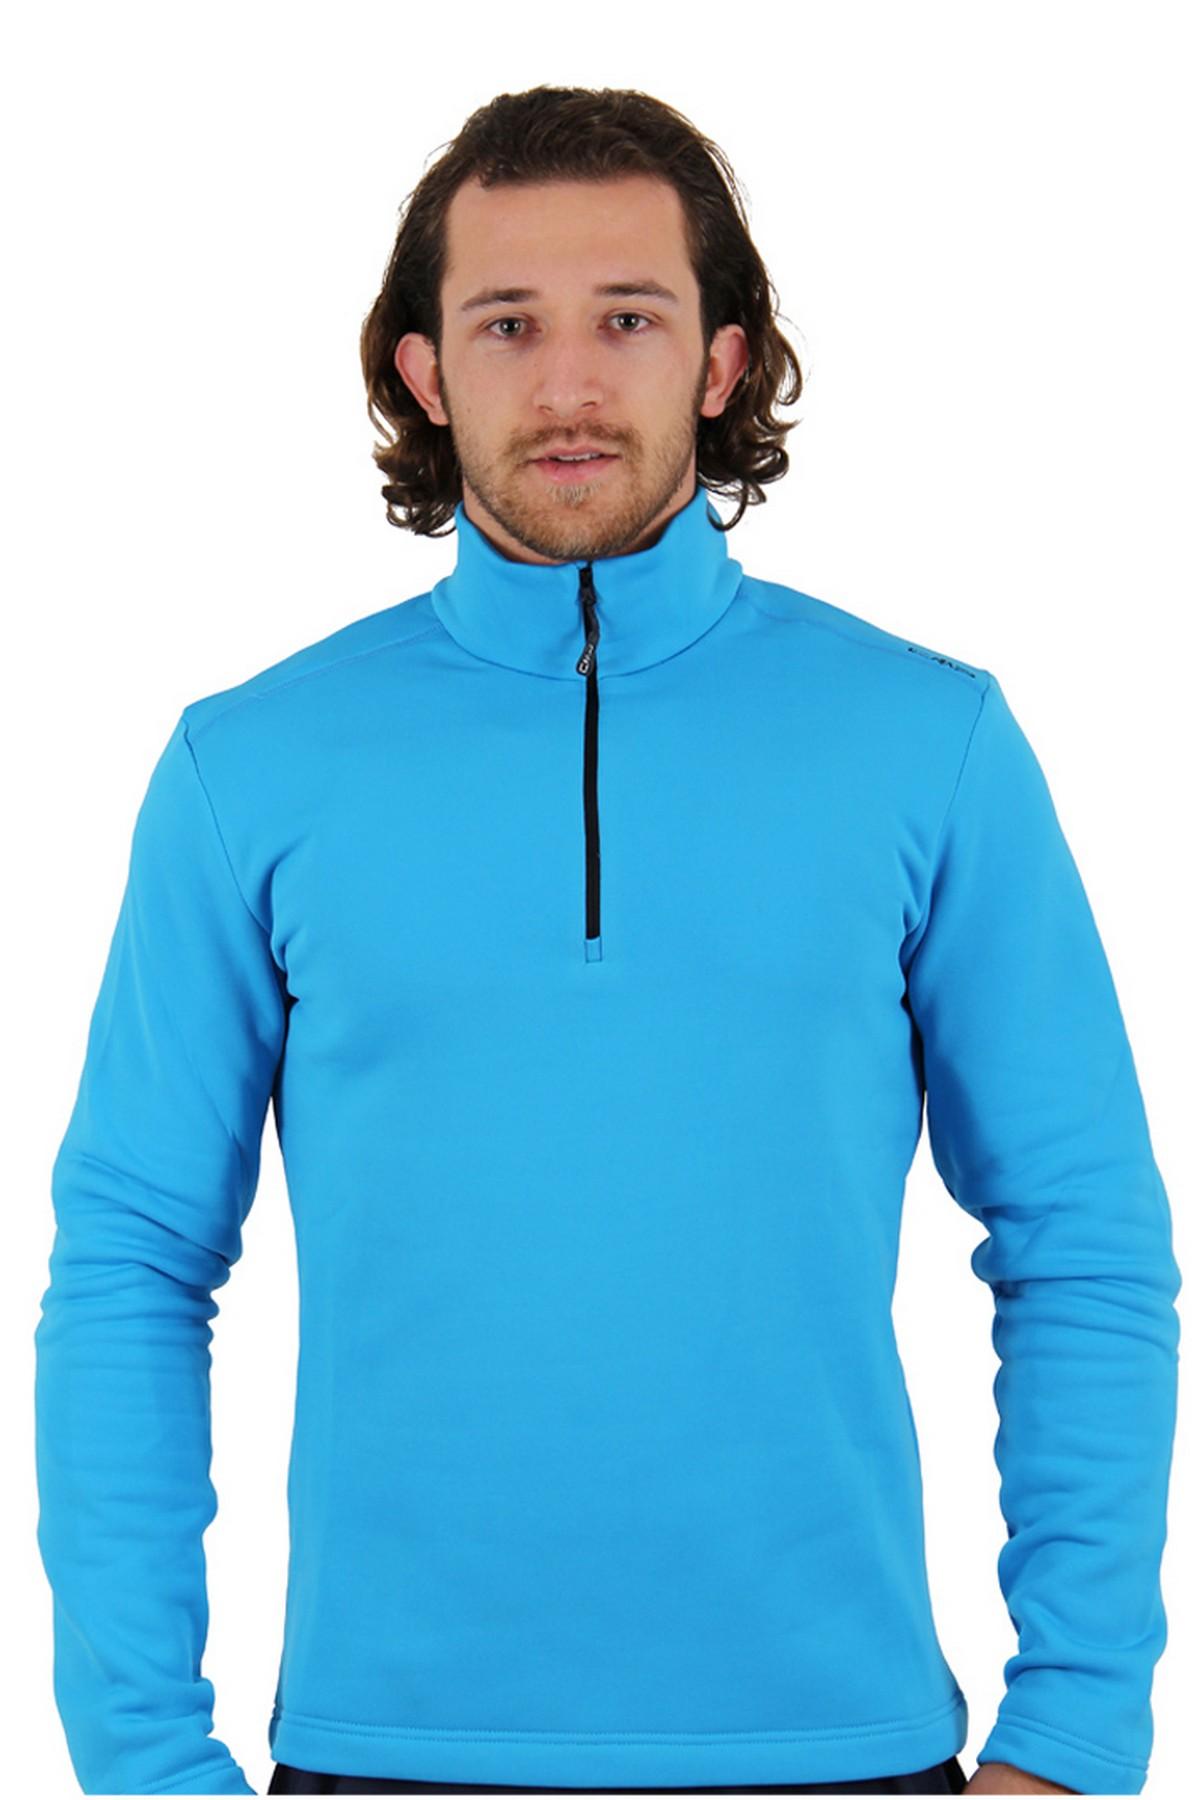 Cmp Erkek Sweatshirt Mavi (3E12107-L591)